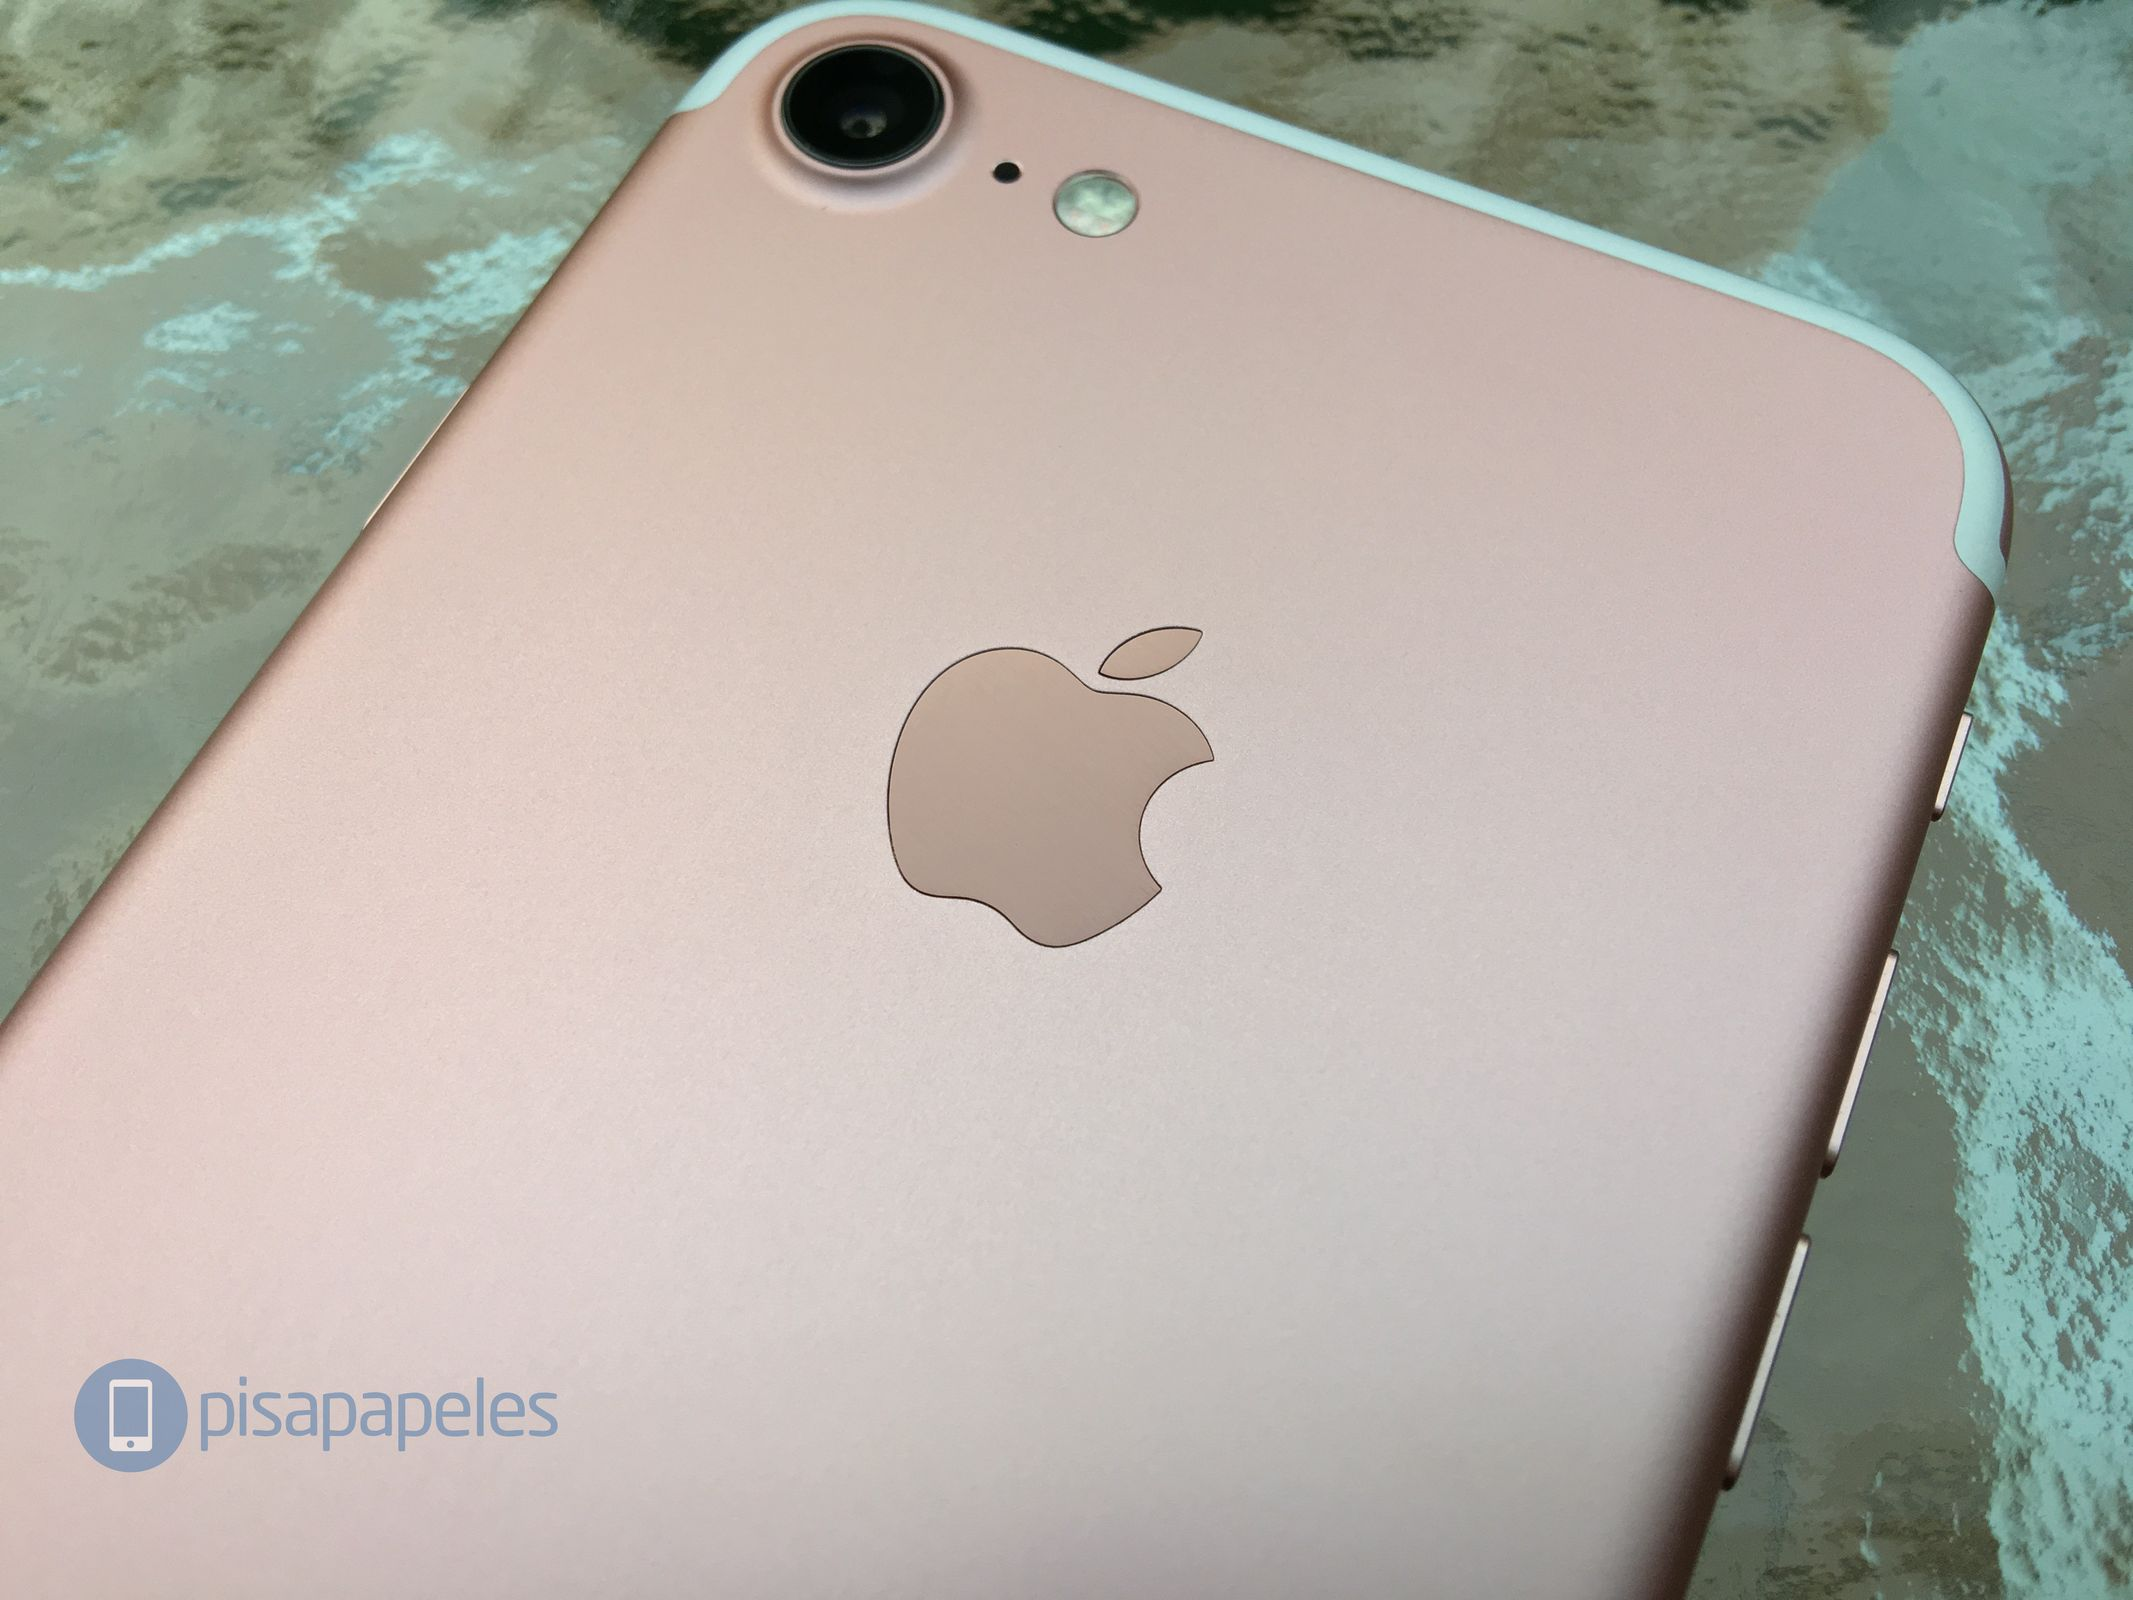 apple-iphone-7-pisapapeles-net_12